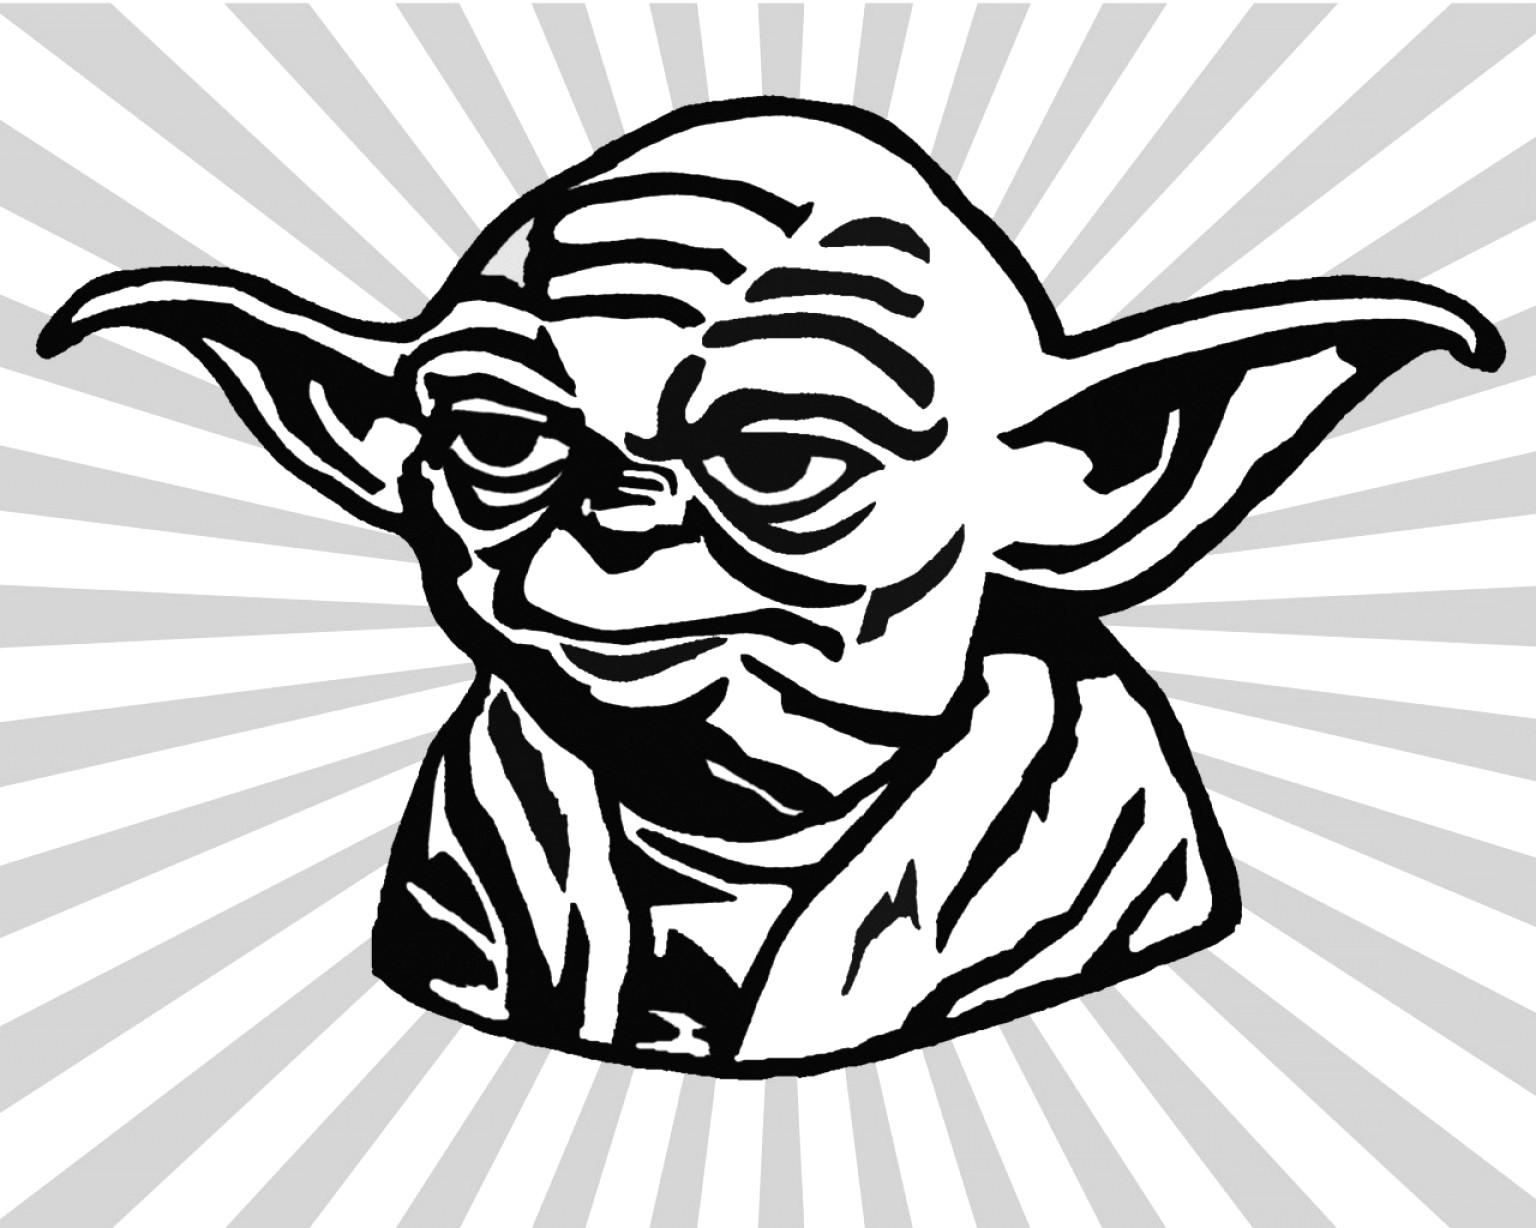 1536x1228 Chic Design Yoda Clipart Cartoon Vector Art Graphics Freevector